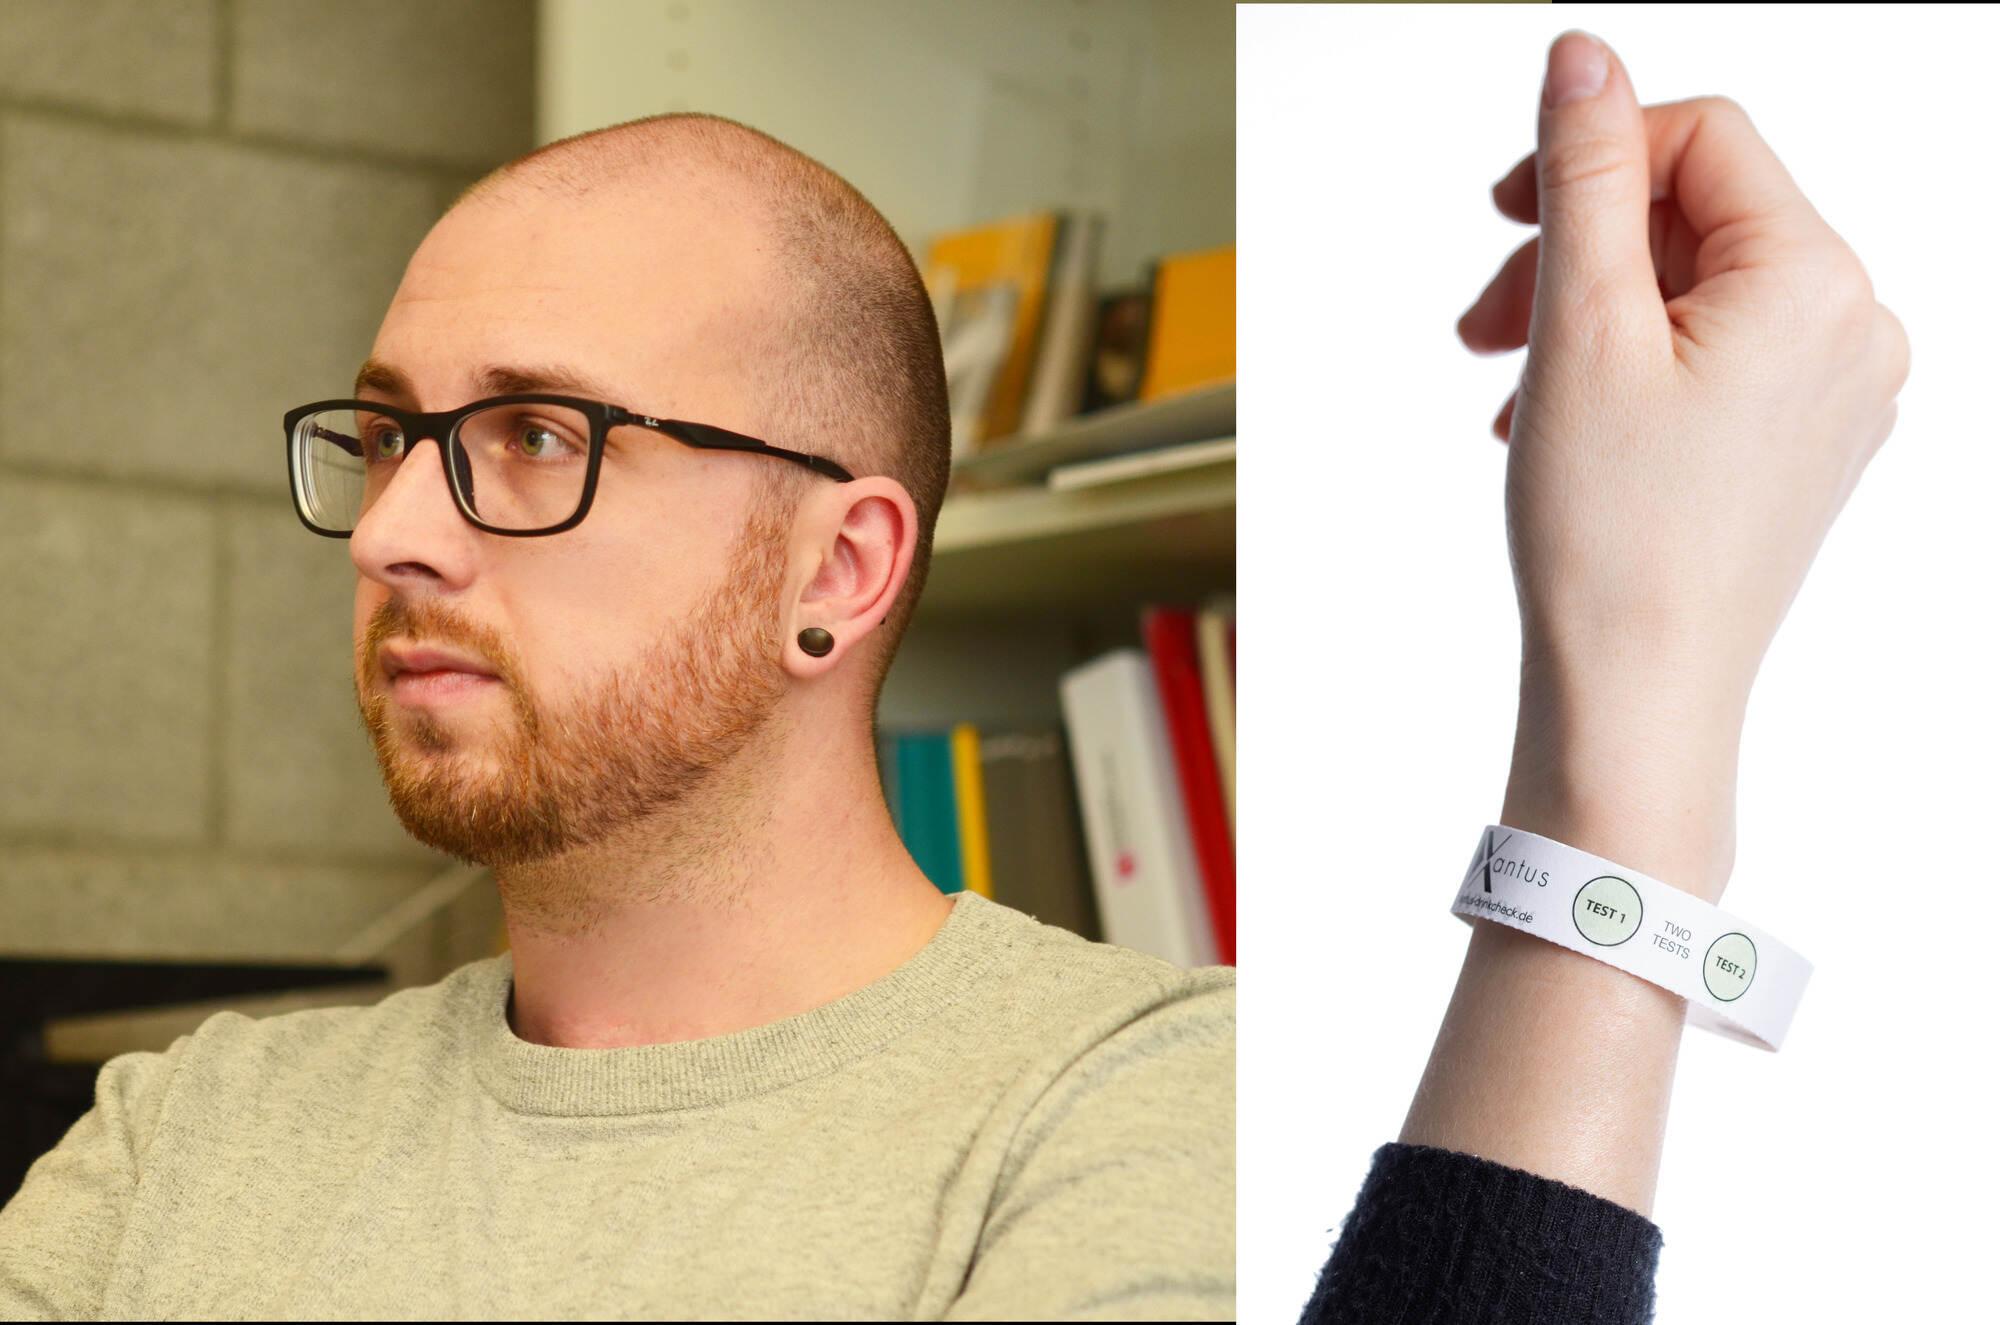 armband gegen ko tropfen